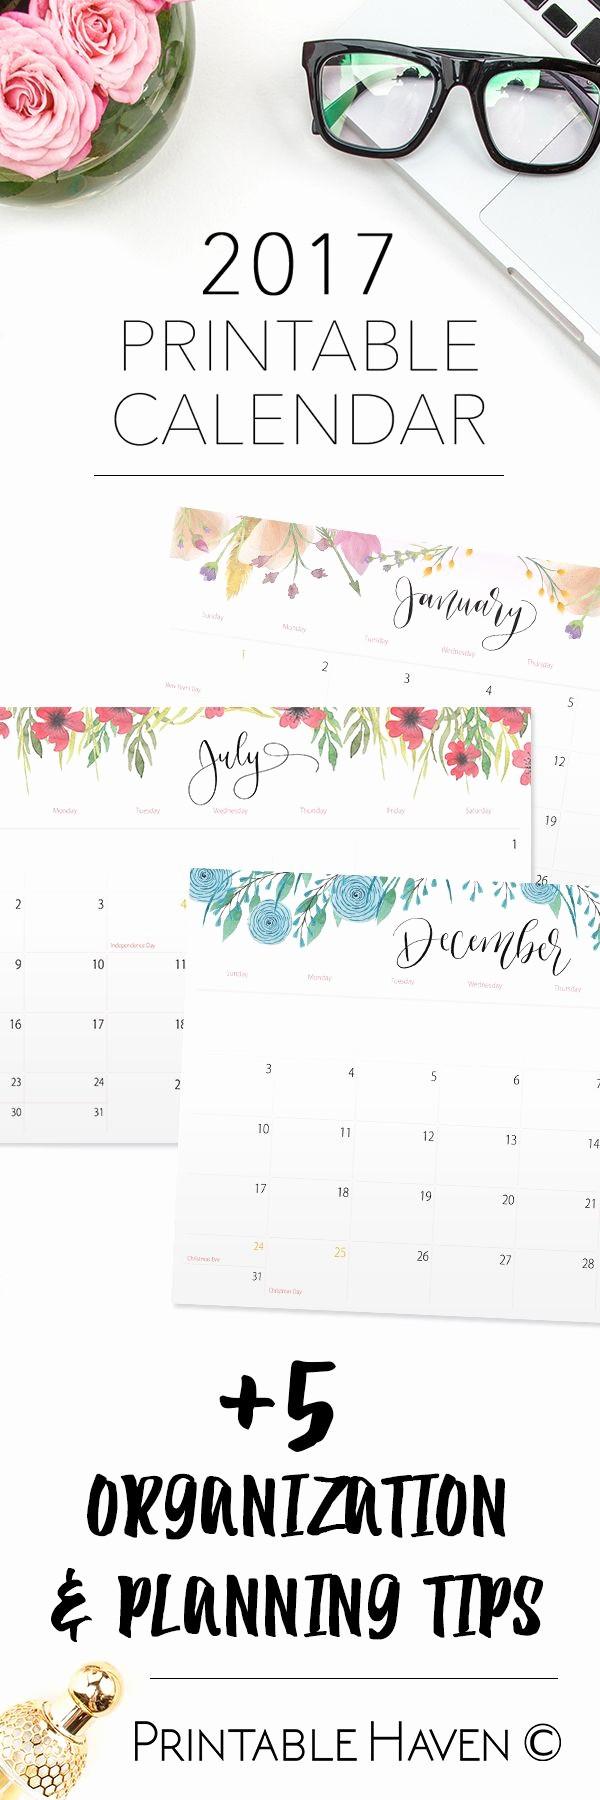 Free Printable Annual Calendar 2017 Unique 25 Best Ideas About 2017 Calendar Printable On Pinterest